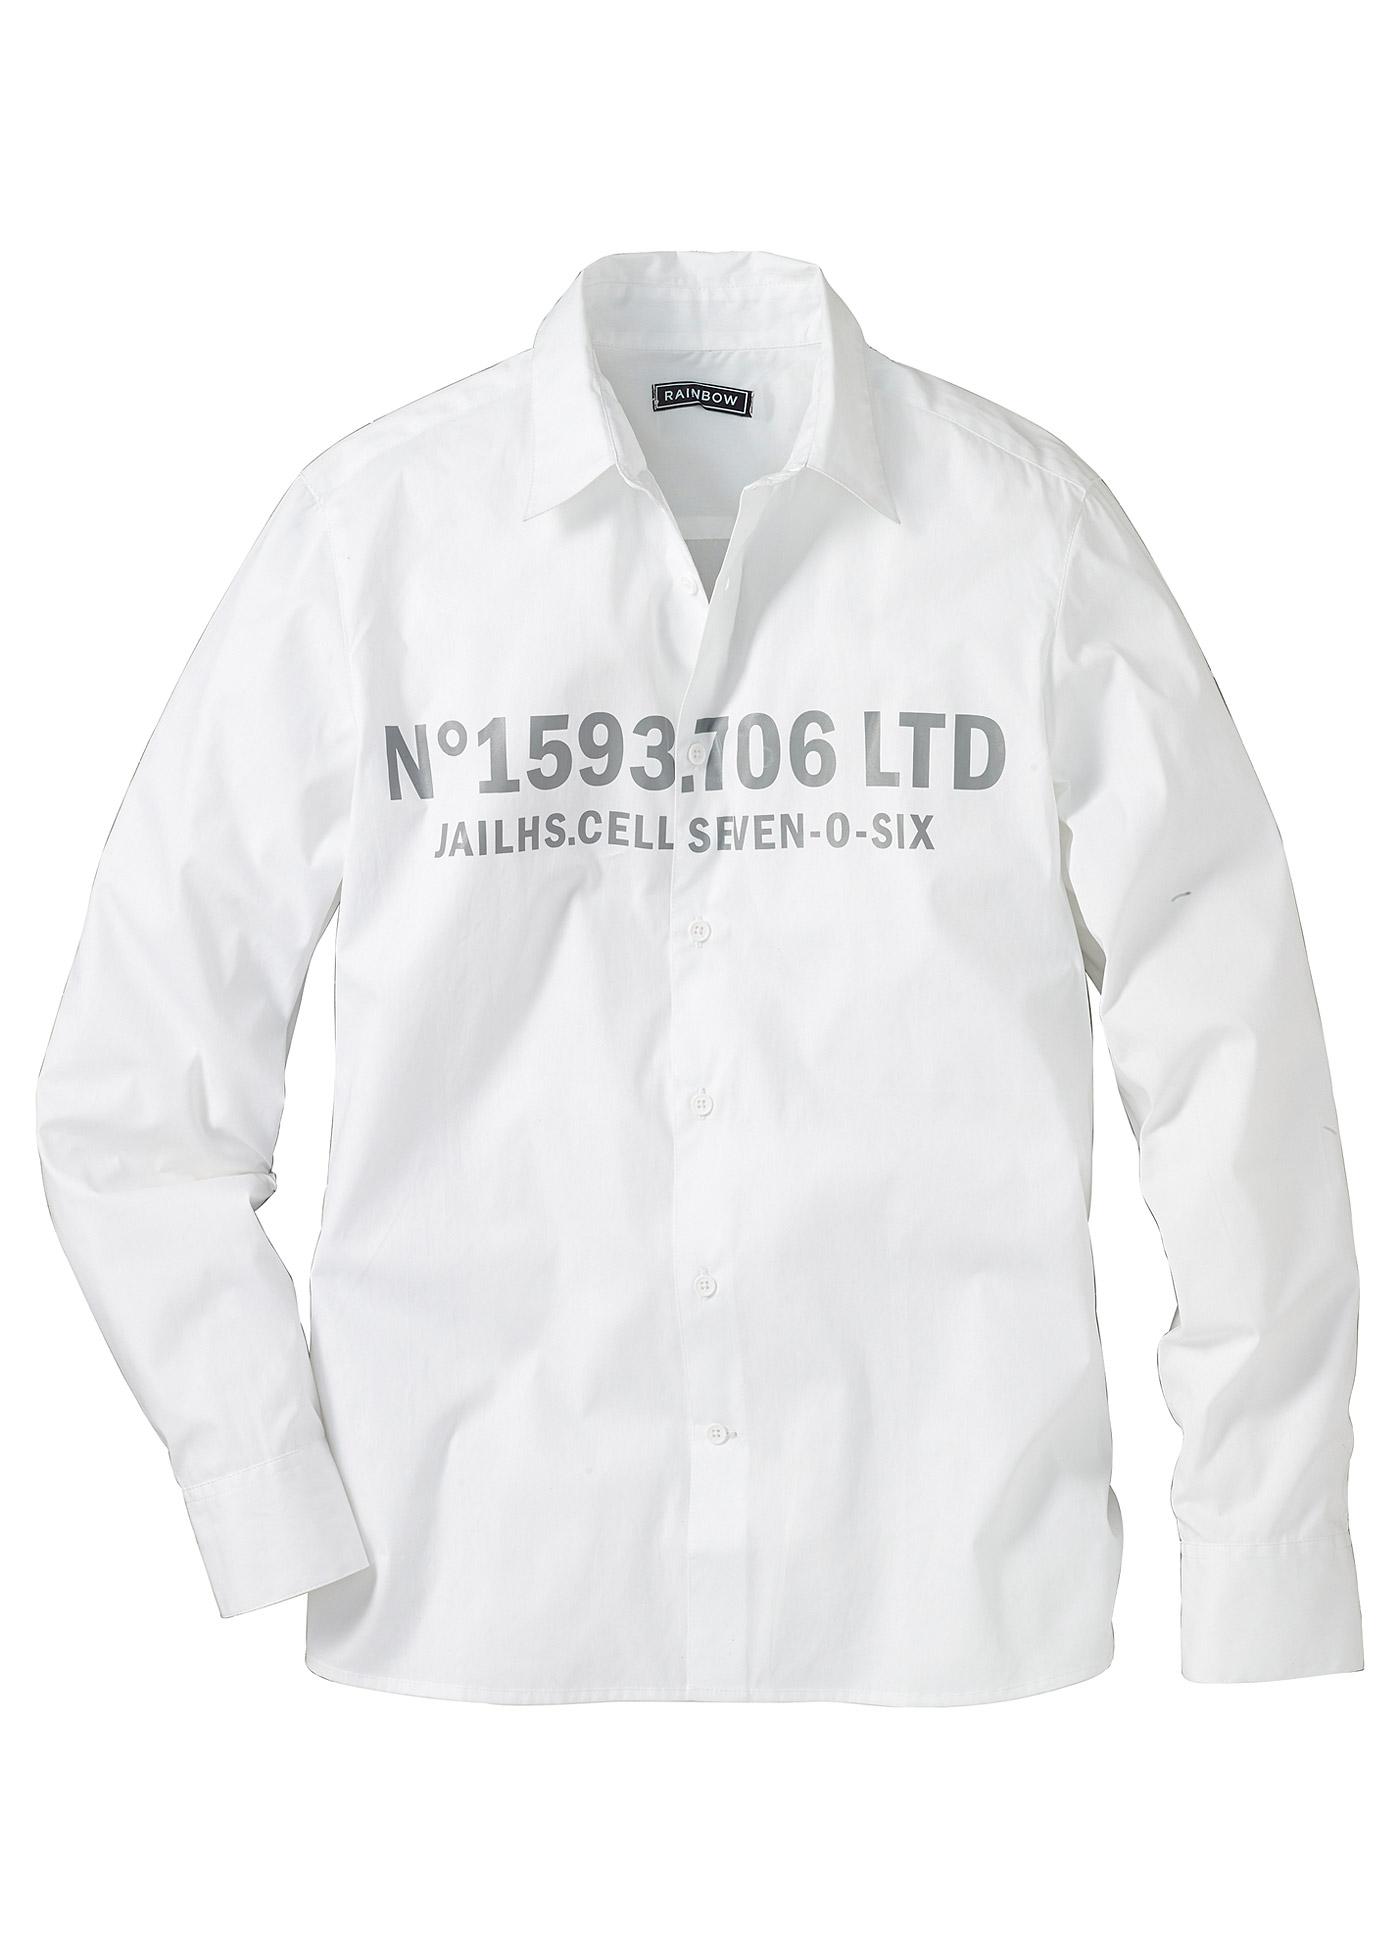 RAINBOW Langarmhemd in weiß für Herren von bonprix Herrenmode Herrenbekleidung Herren Hemden Herren Hemd Langarm